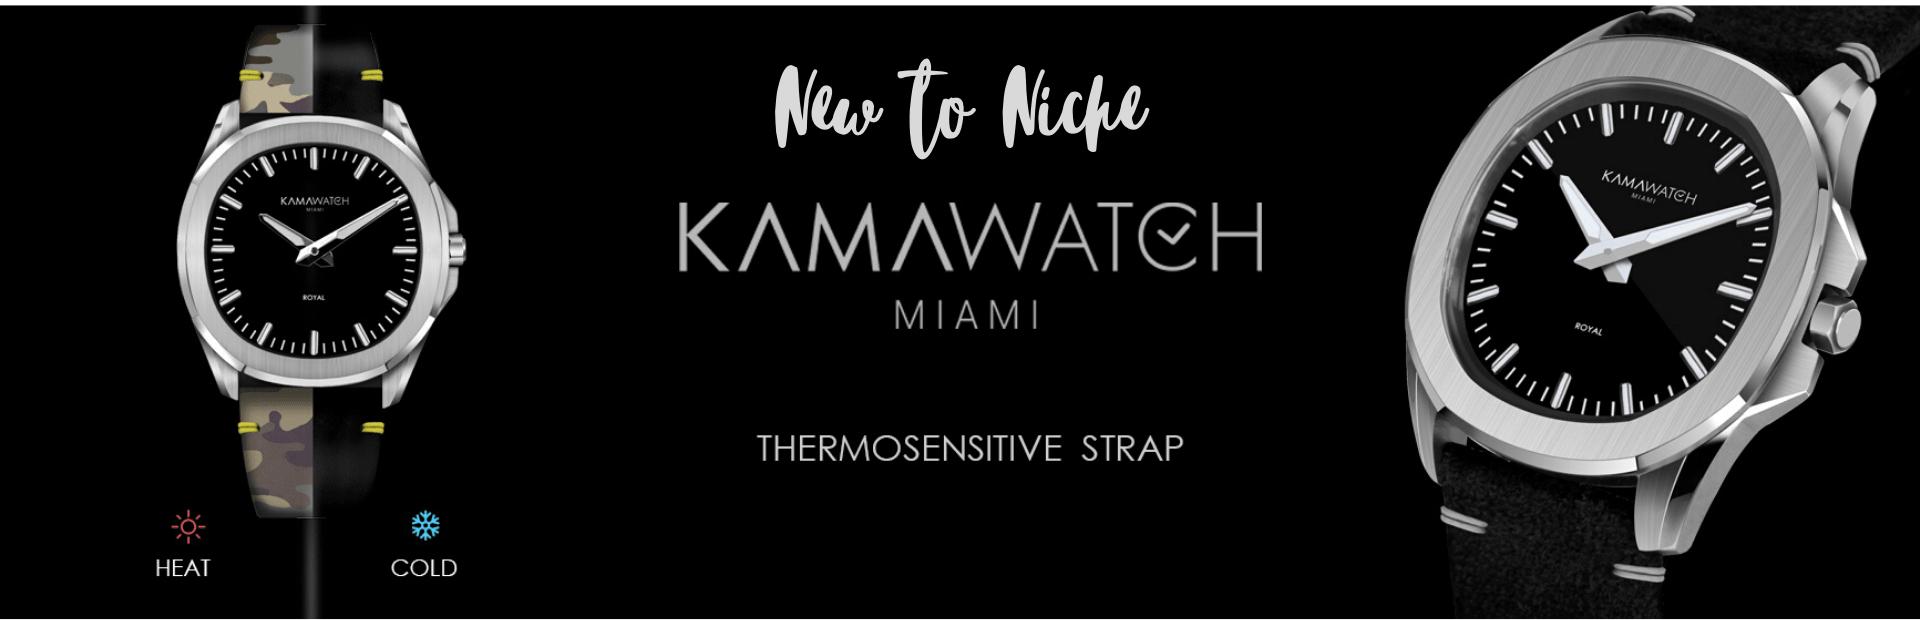 Shop Kamawatch Online UK